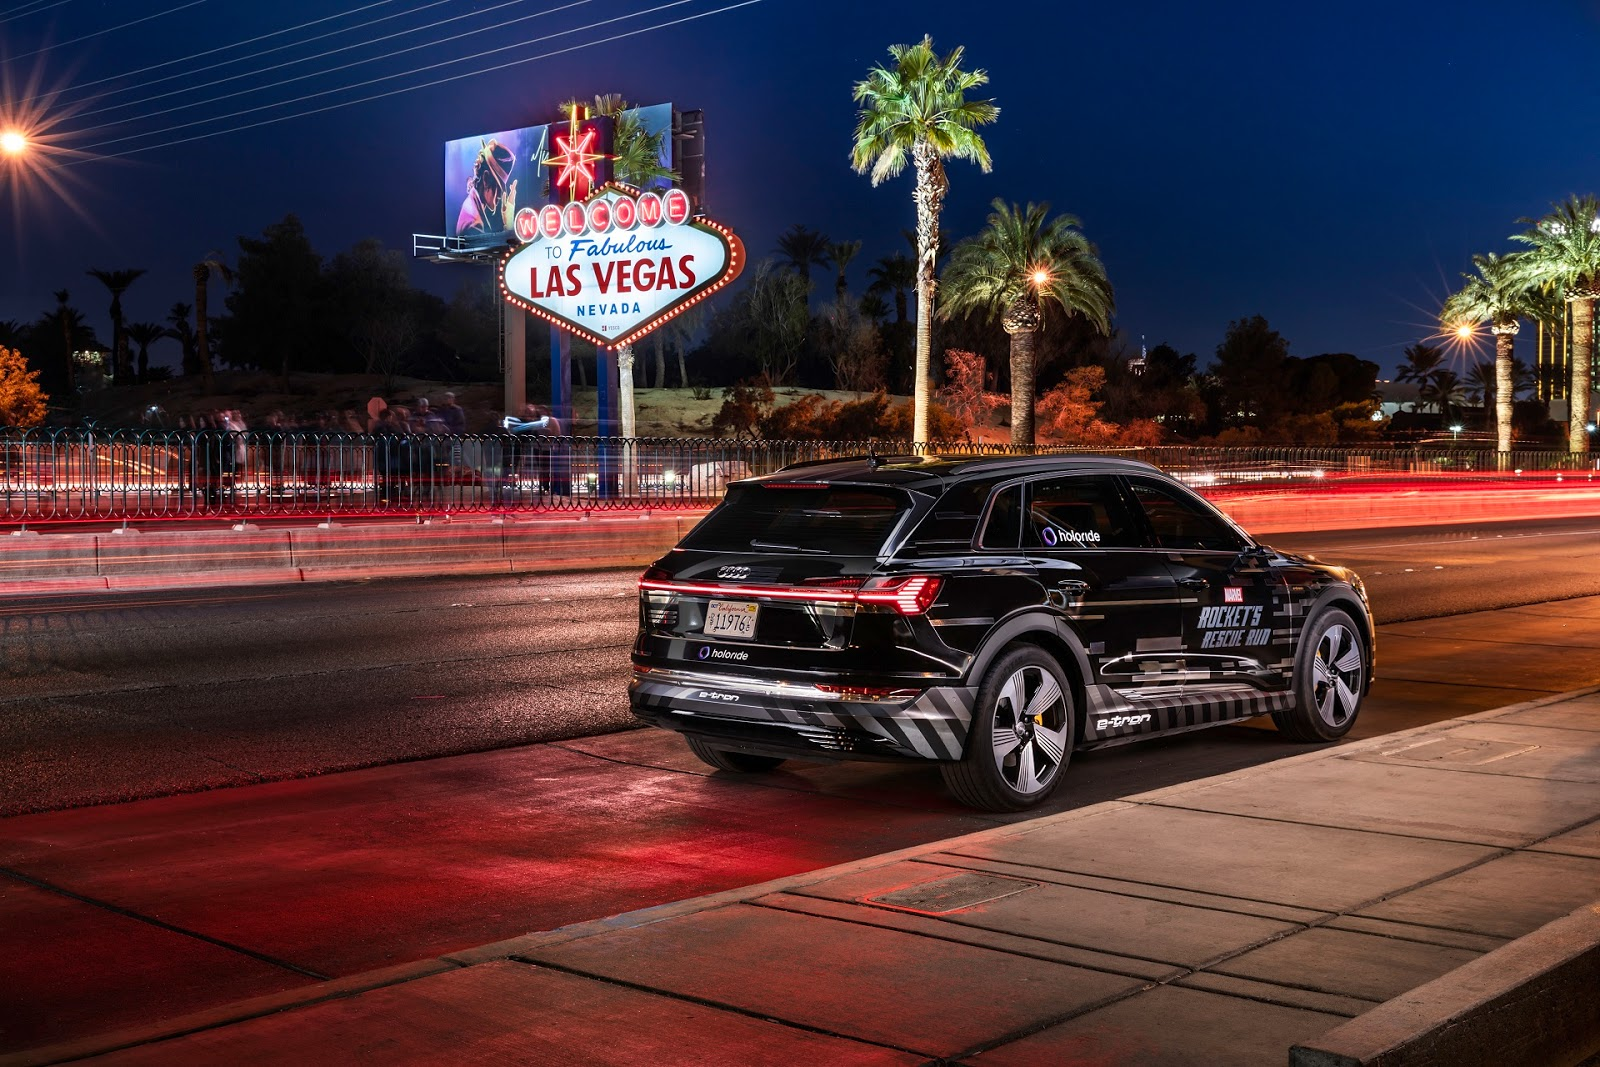 H2BAUDI2B25CE25A325CE25A425CE25972BCES 5 H Audi εξελίσσει VR videogames για το αυτοκίνητο! Audi, Electric cars, video, videos, βίντεο, Τεχνολογία